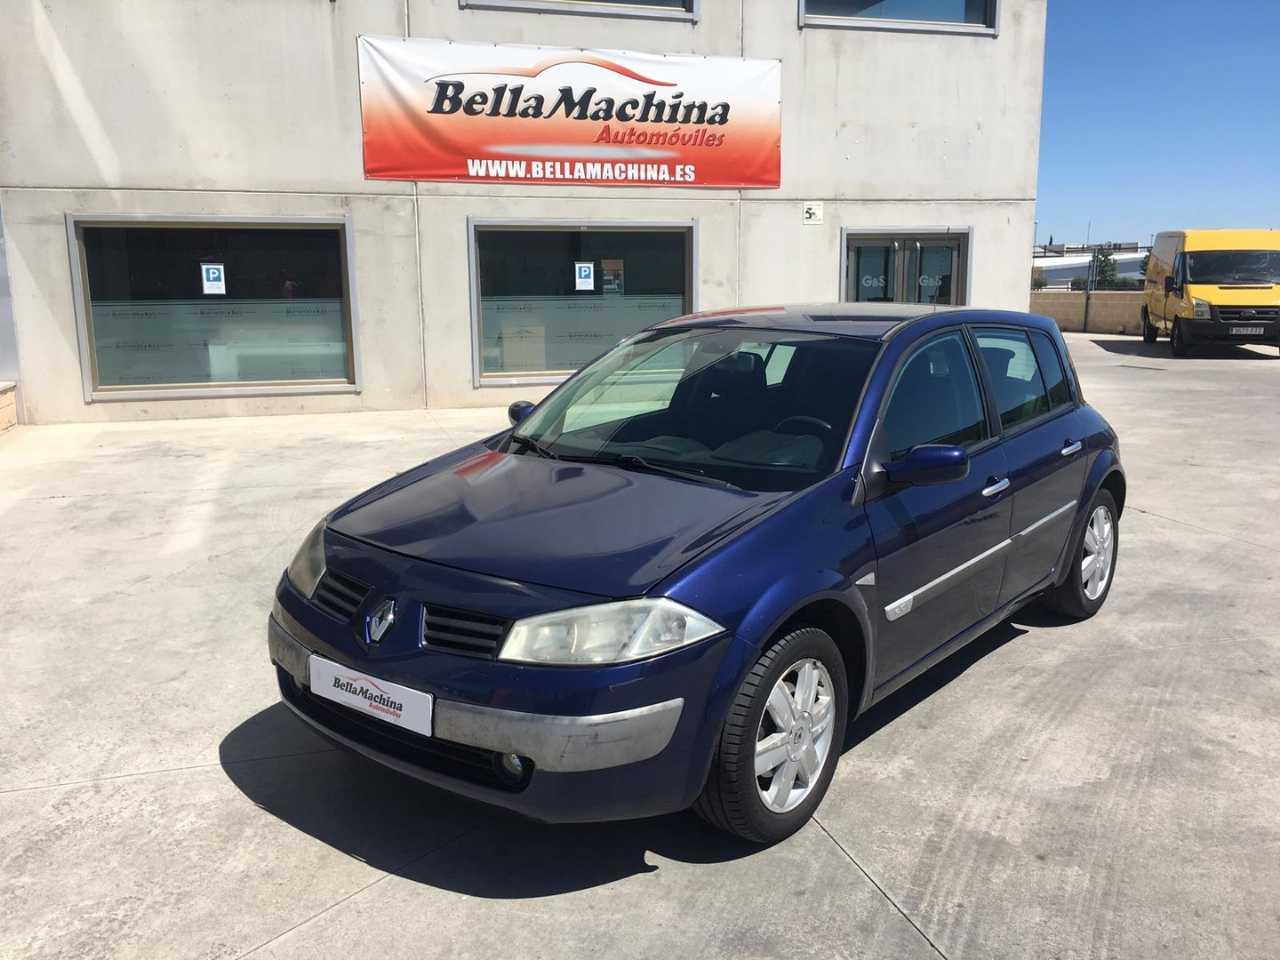 Renault Megane 1.5 DCI *** FINANCIACION ***   - Foto 1